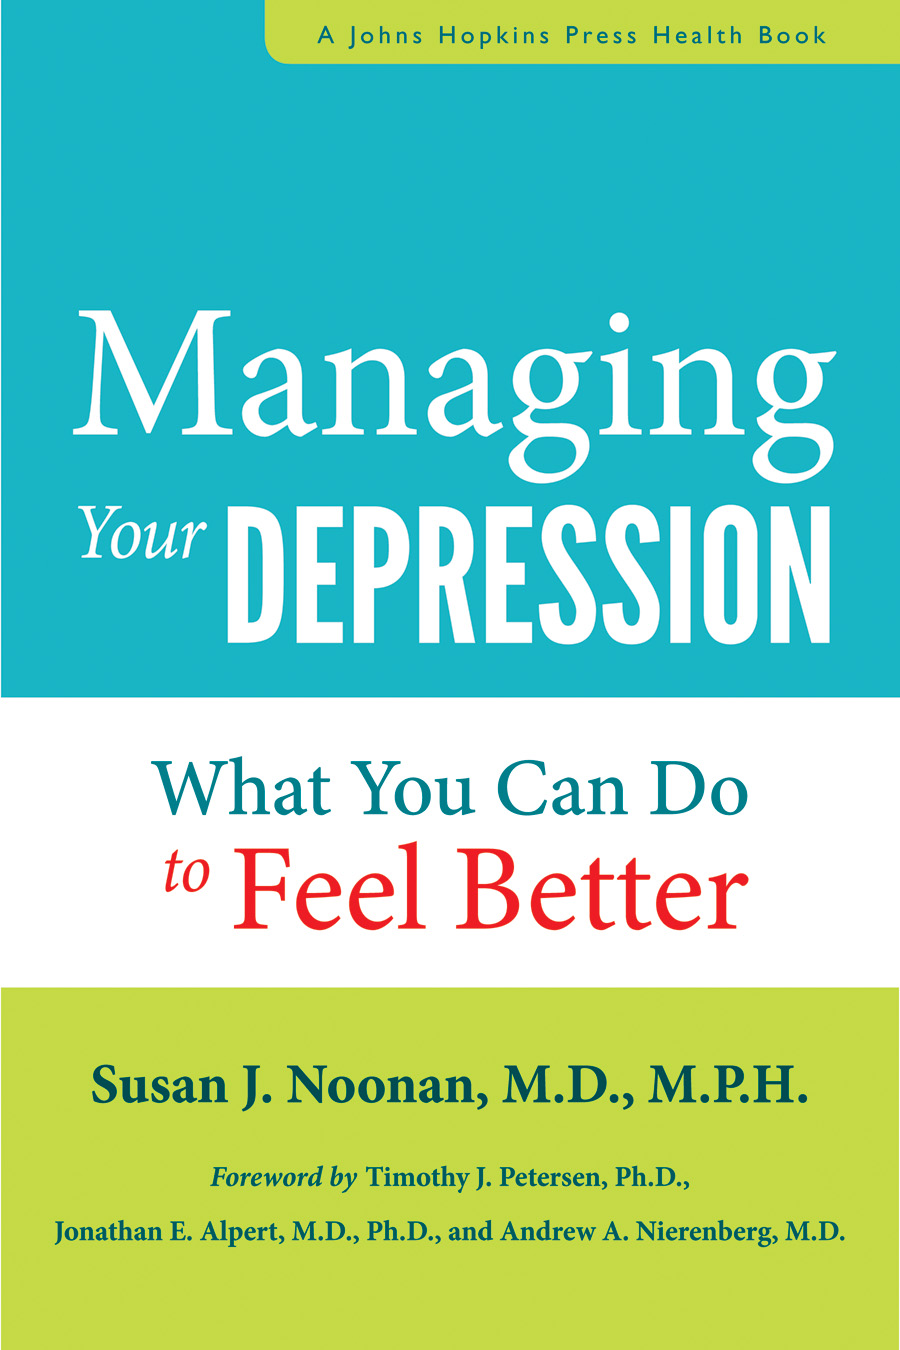 Managing Depression Johns Hopkins University Press Blog